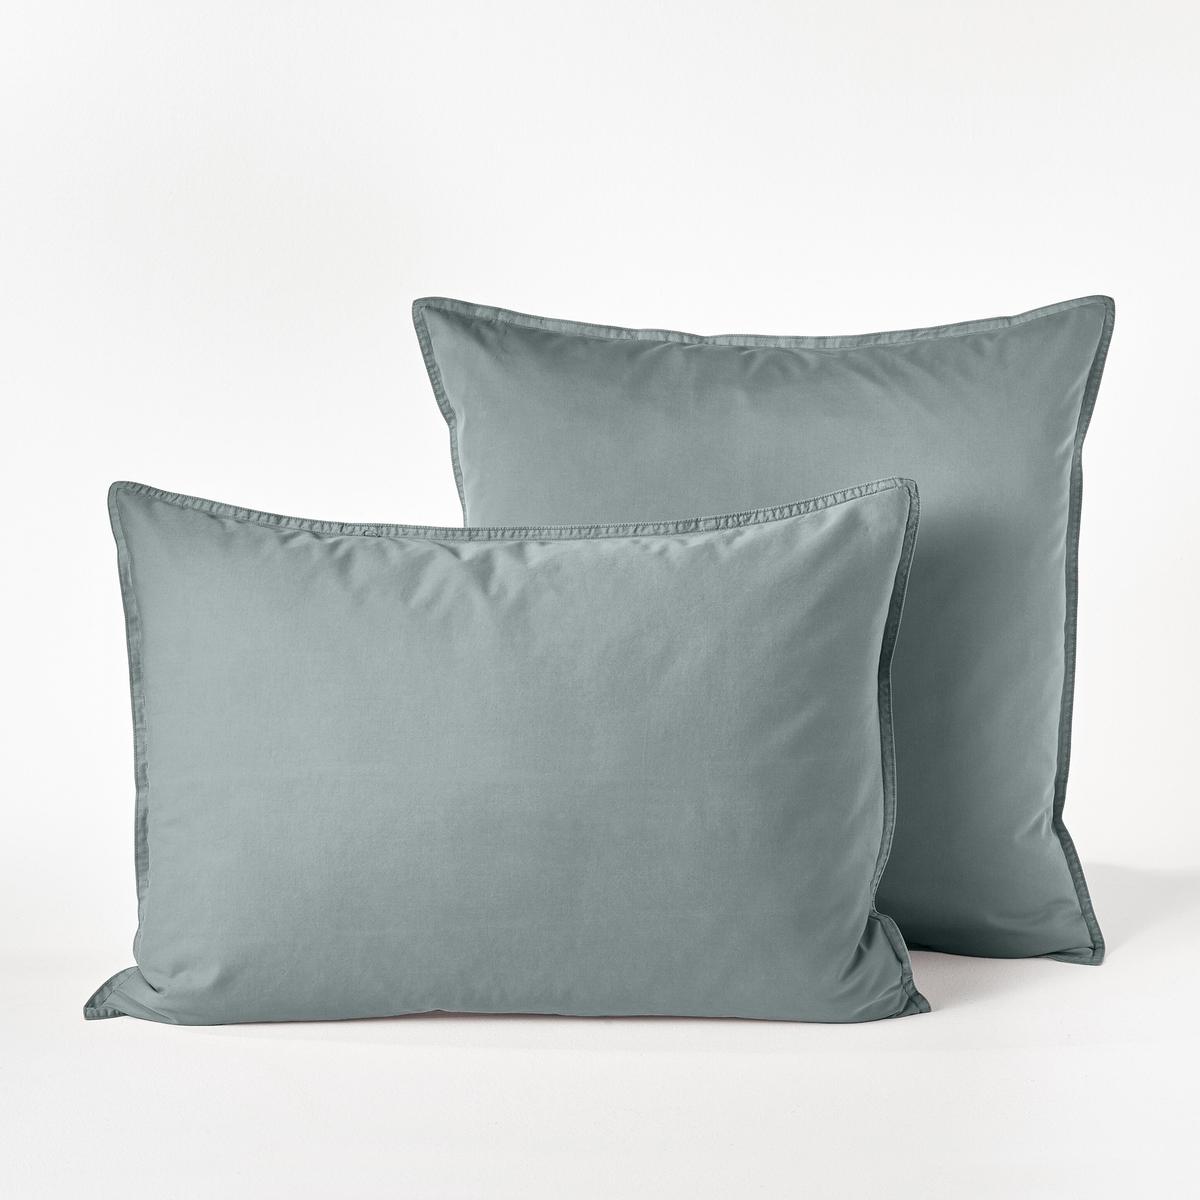 Наволочка, Yvonni<br><br>Цвет: серо-зеленый<br>Размер: 50 x 70  см